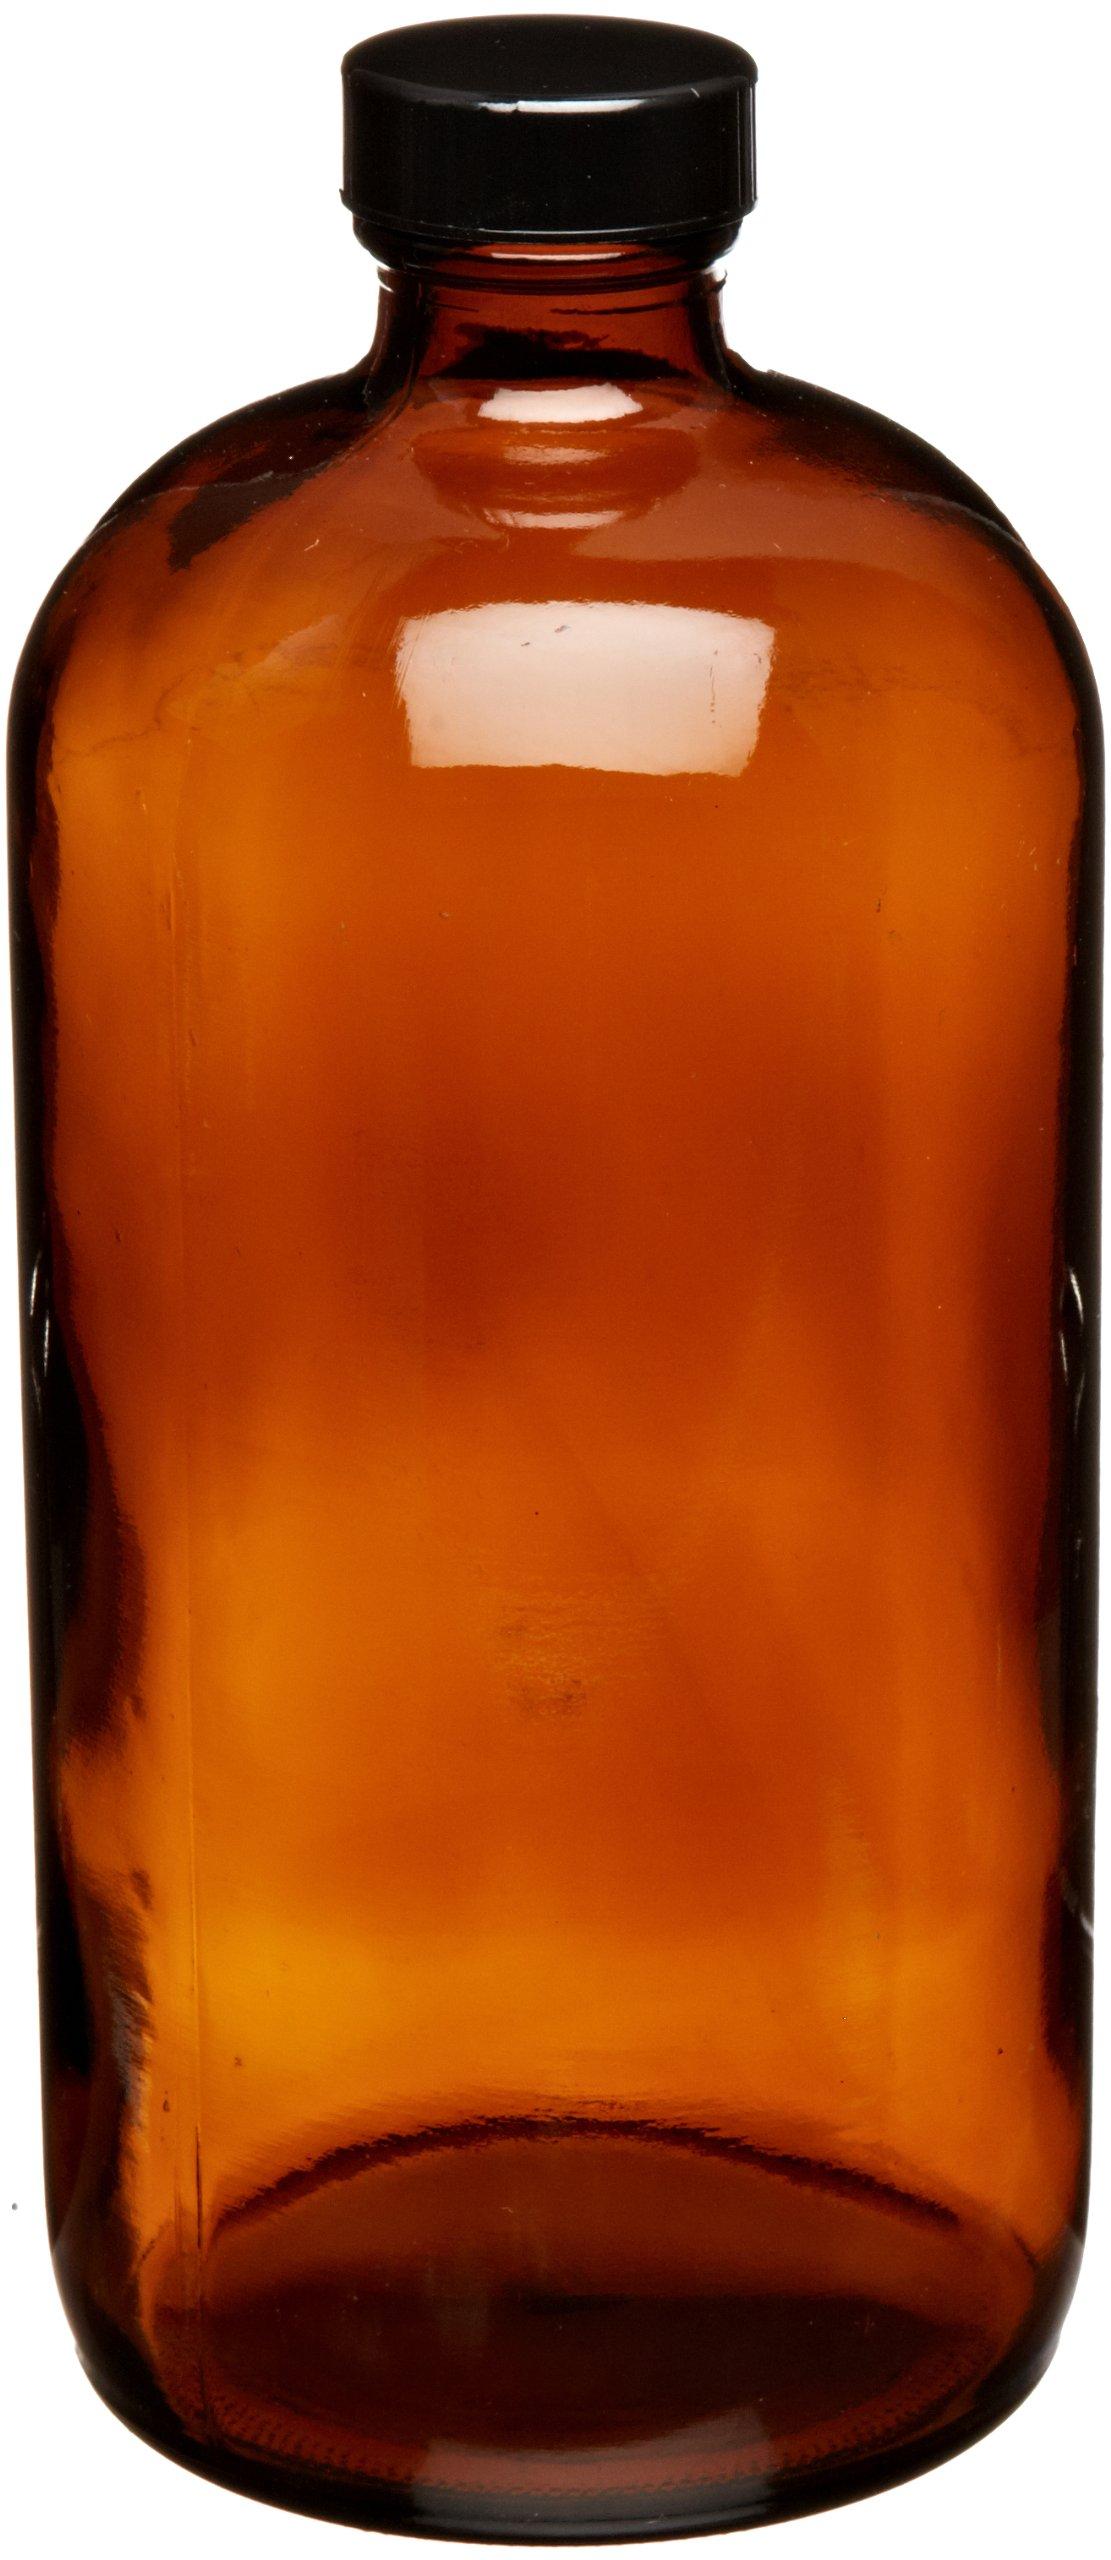 JG Finneran D0161-32 Amber Borosilicate Glass Standard Boston Round Bottle with Black Phenolic Closure, PE Cone Lined, 33-400mm Cap Size, 32oz Capacity (Pack of 12)